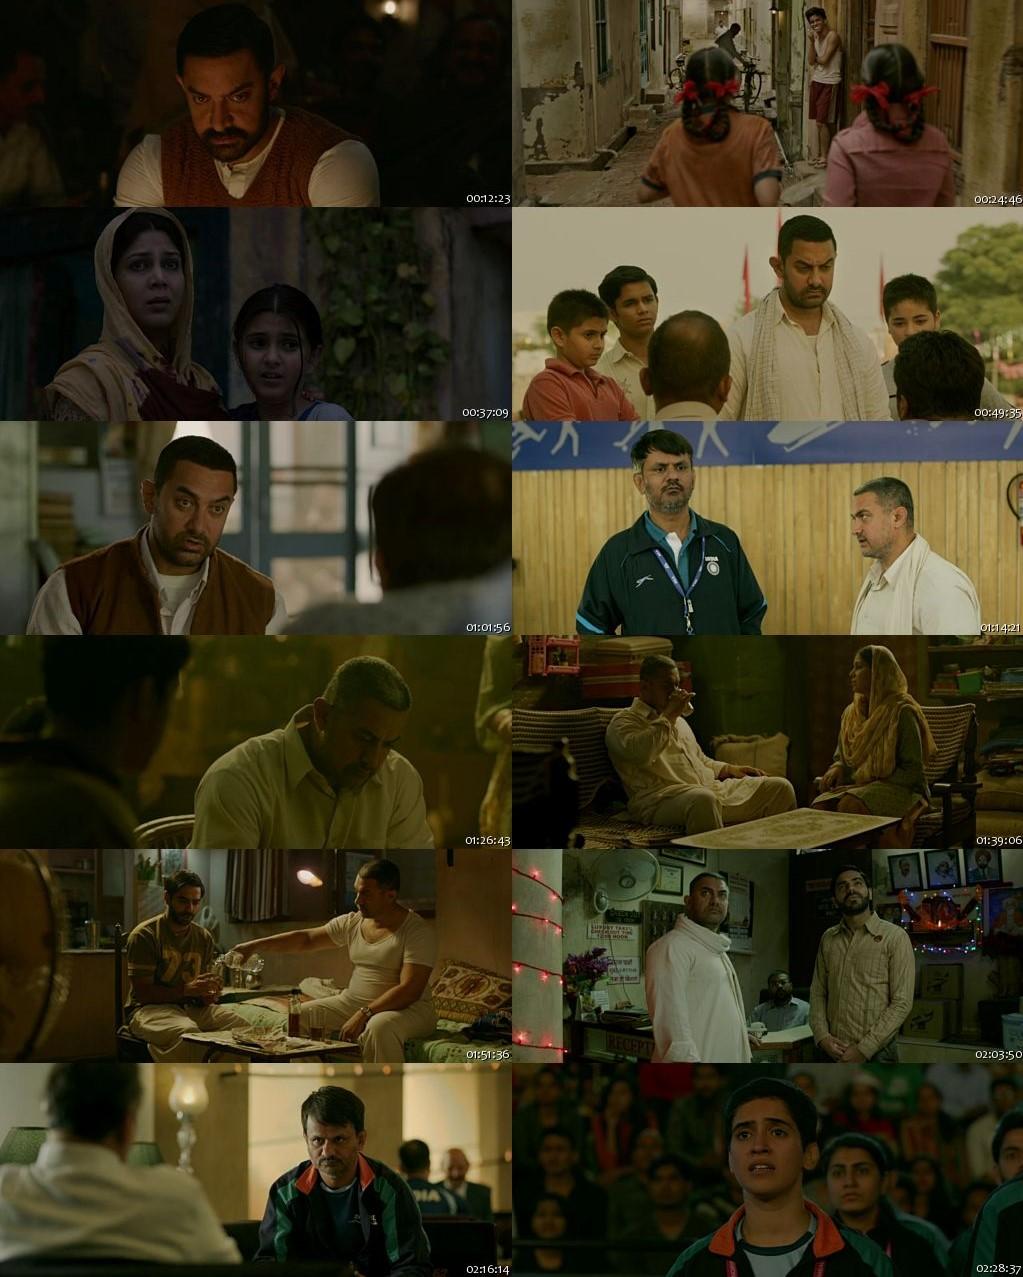 Dangal 2016 Full Hindi Movie Online Watch BRRip 720p